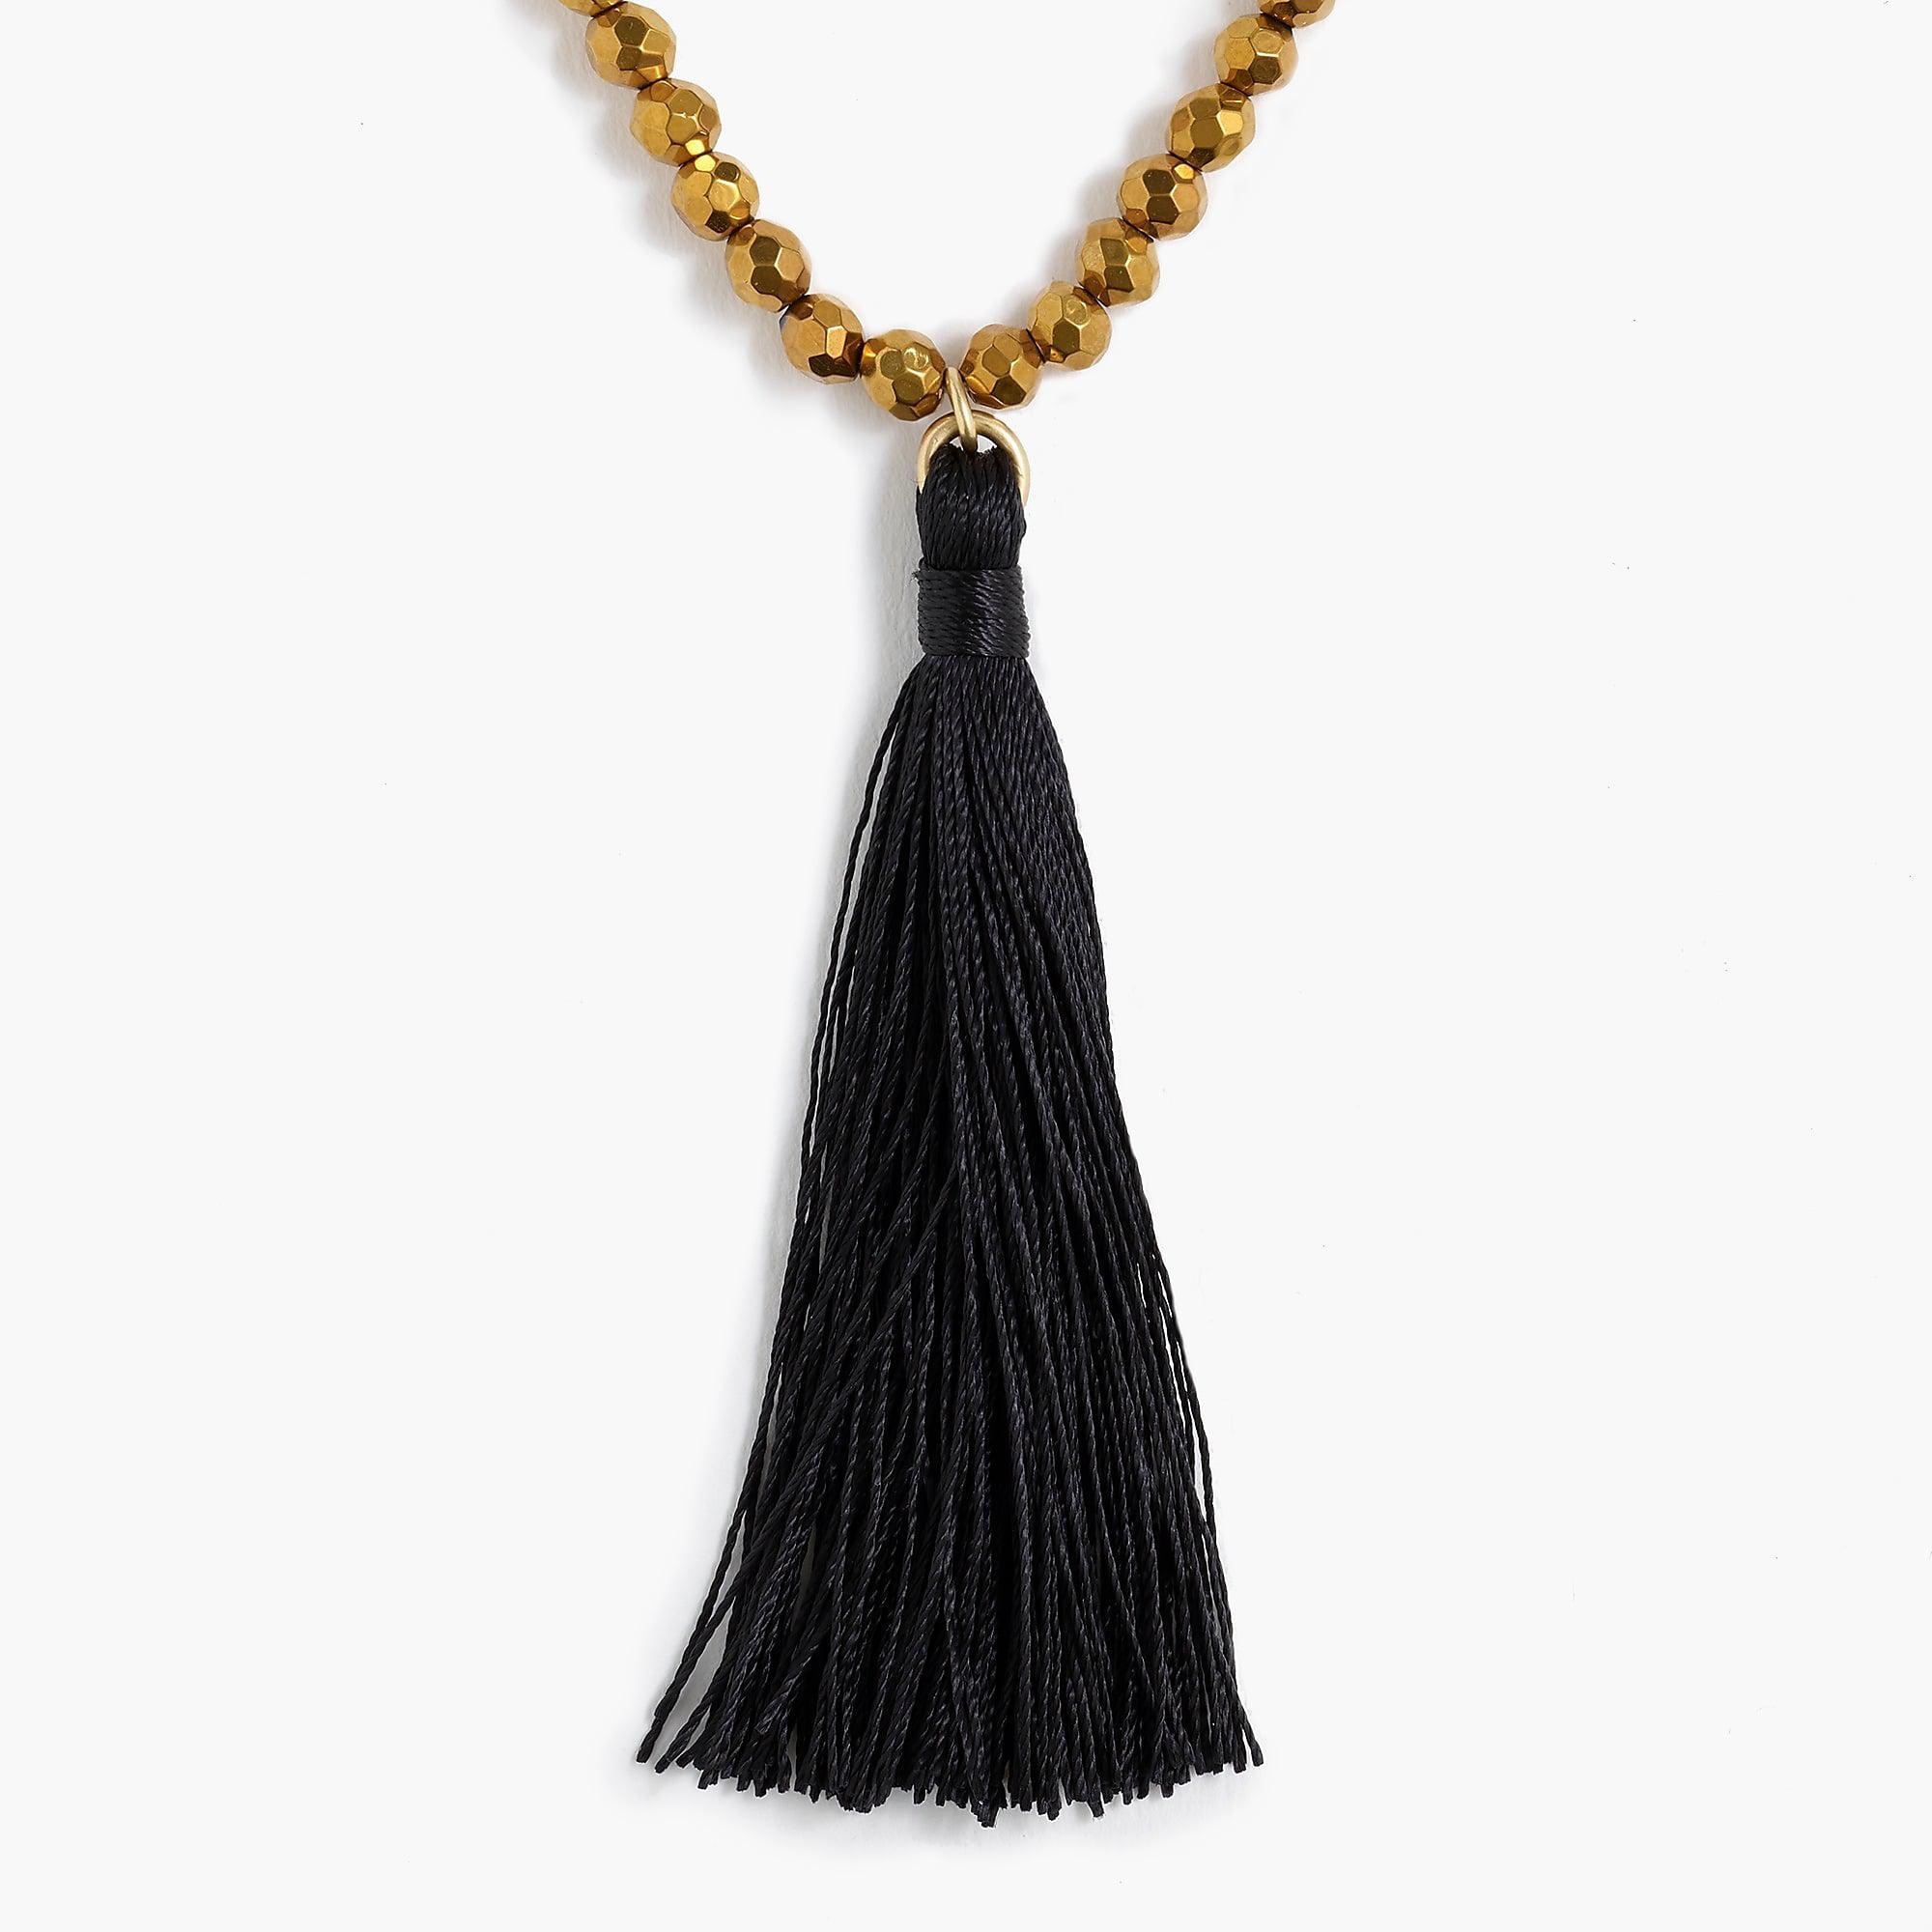 dc76654f8ec24d J.Crew Beaded Pendant Necklace With Thread Tassel in Black - Lyst